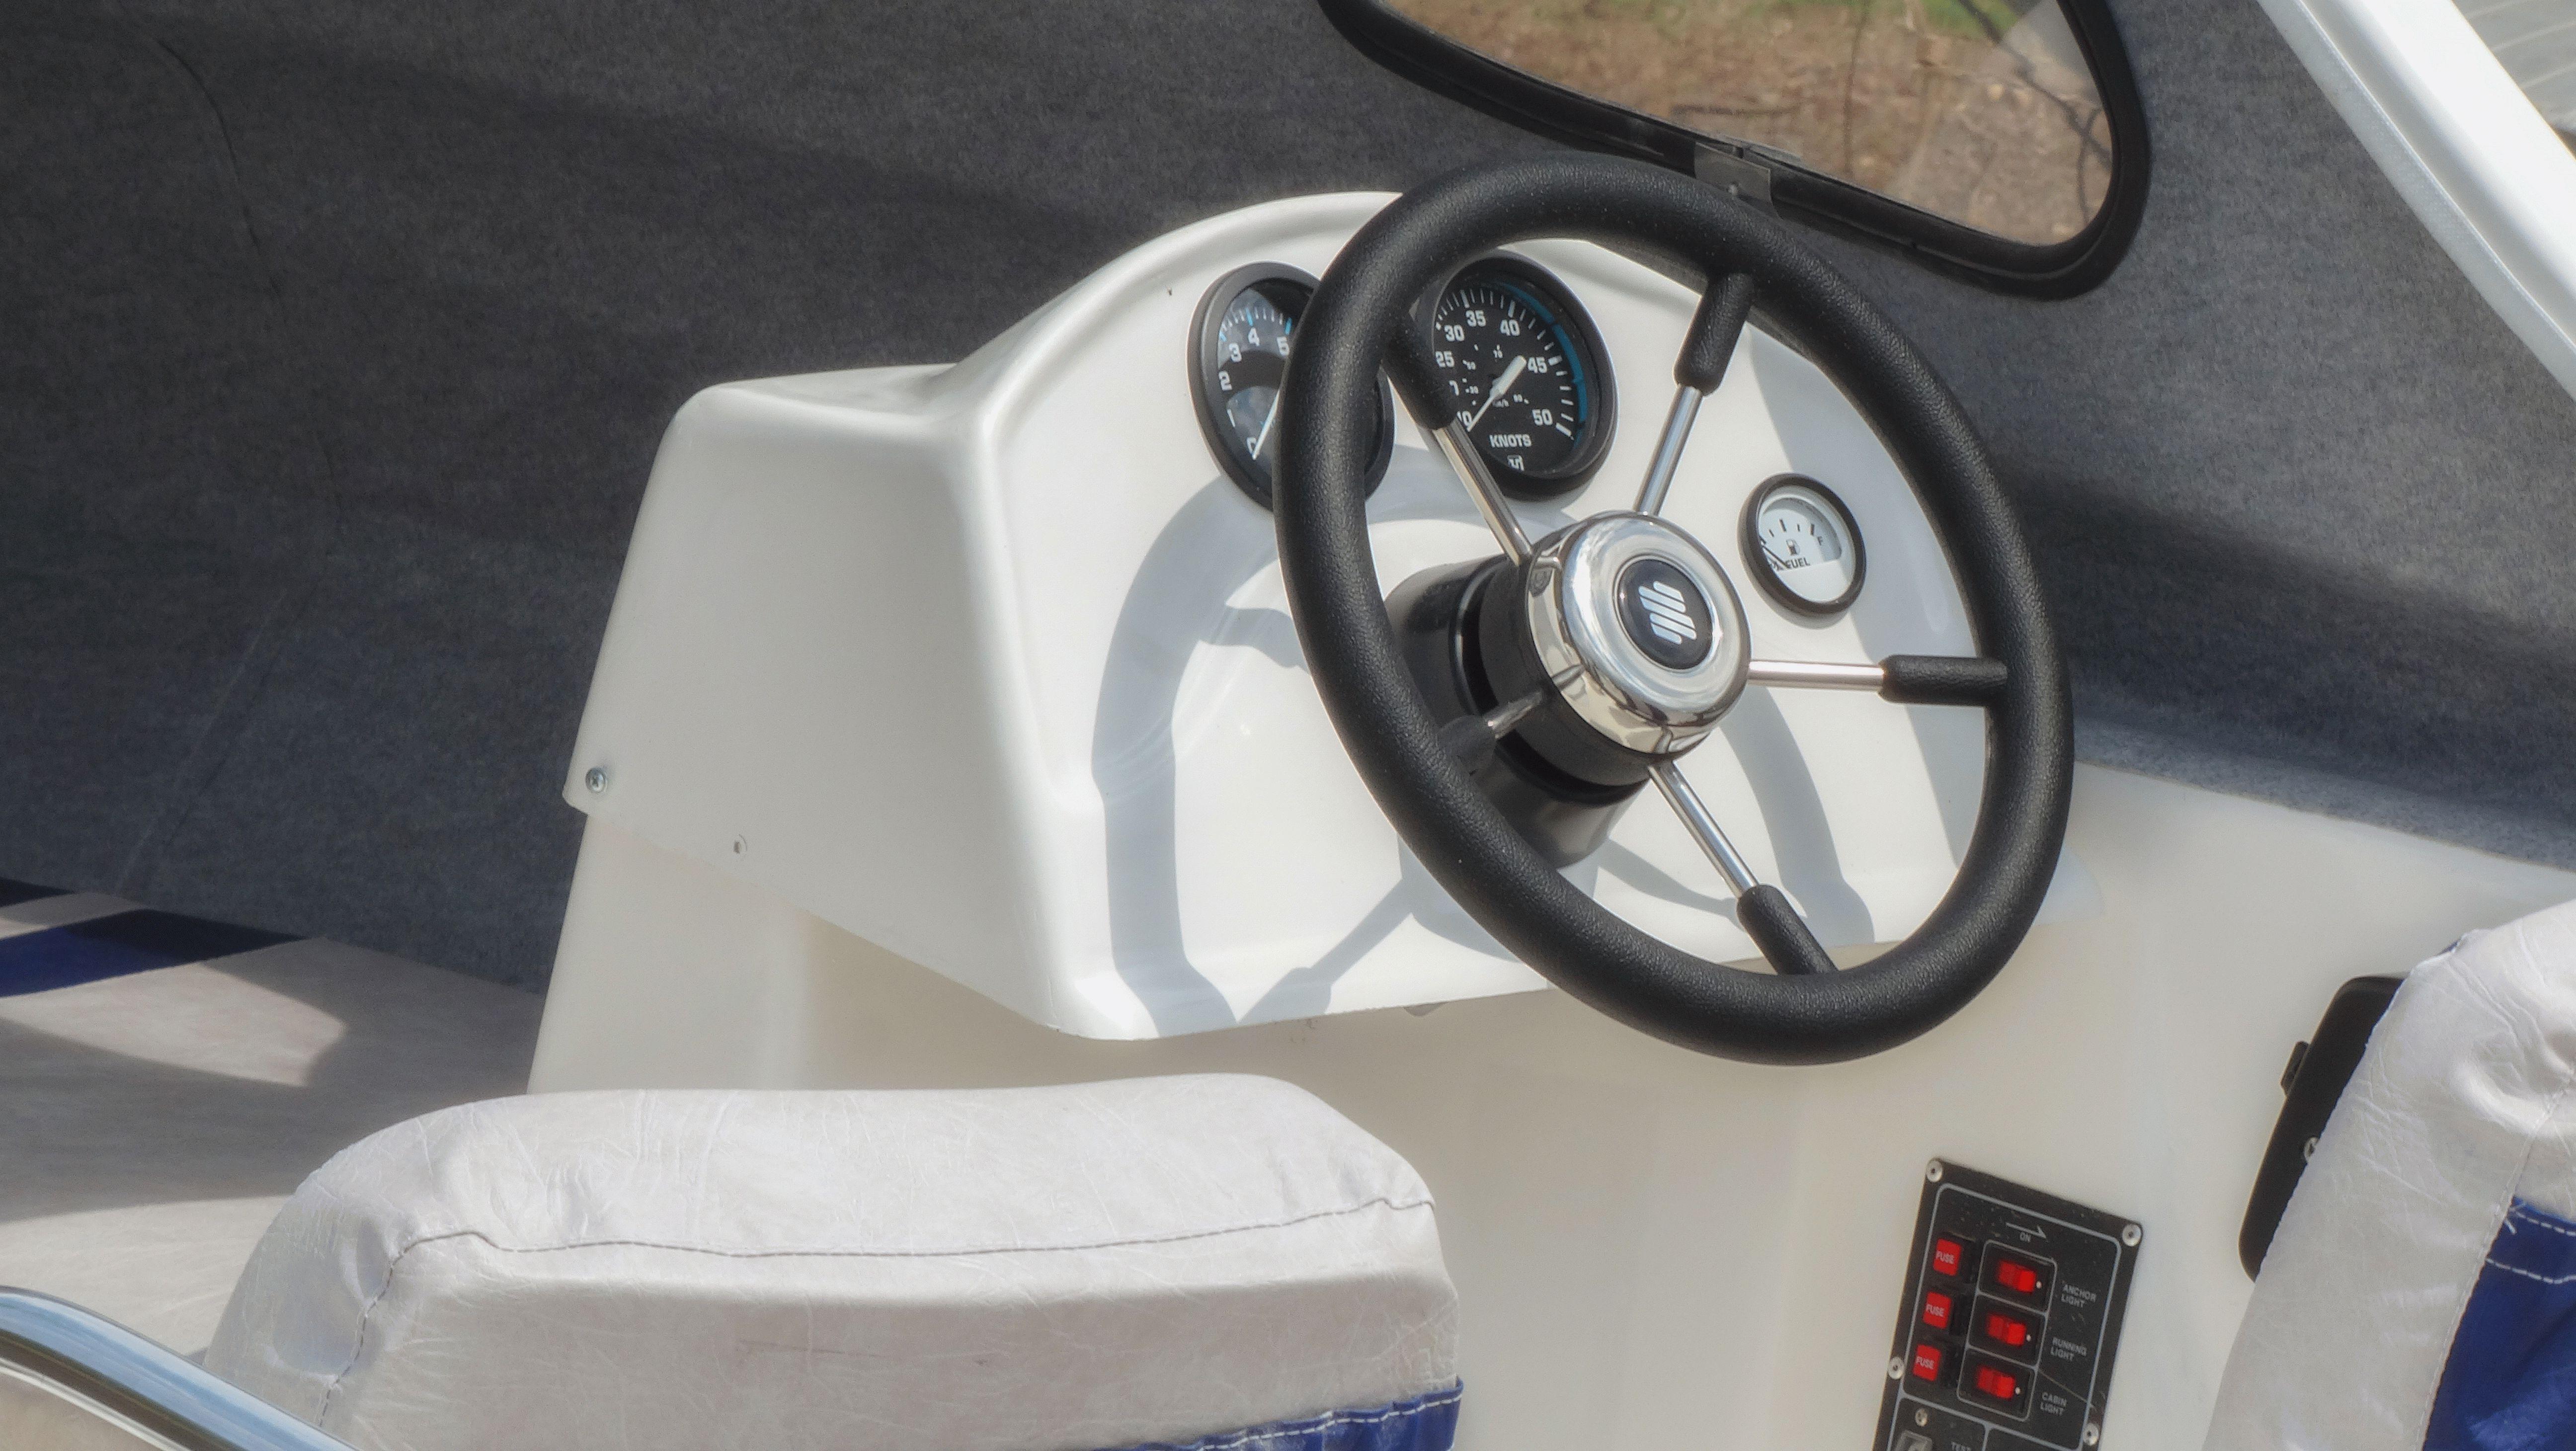 катер для доставки прикормки на рыбалке